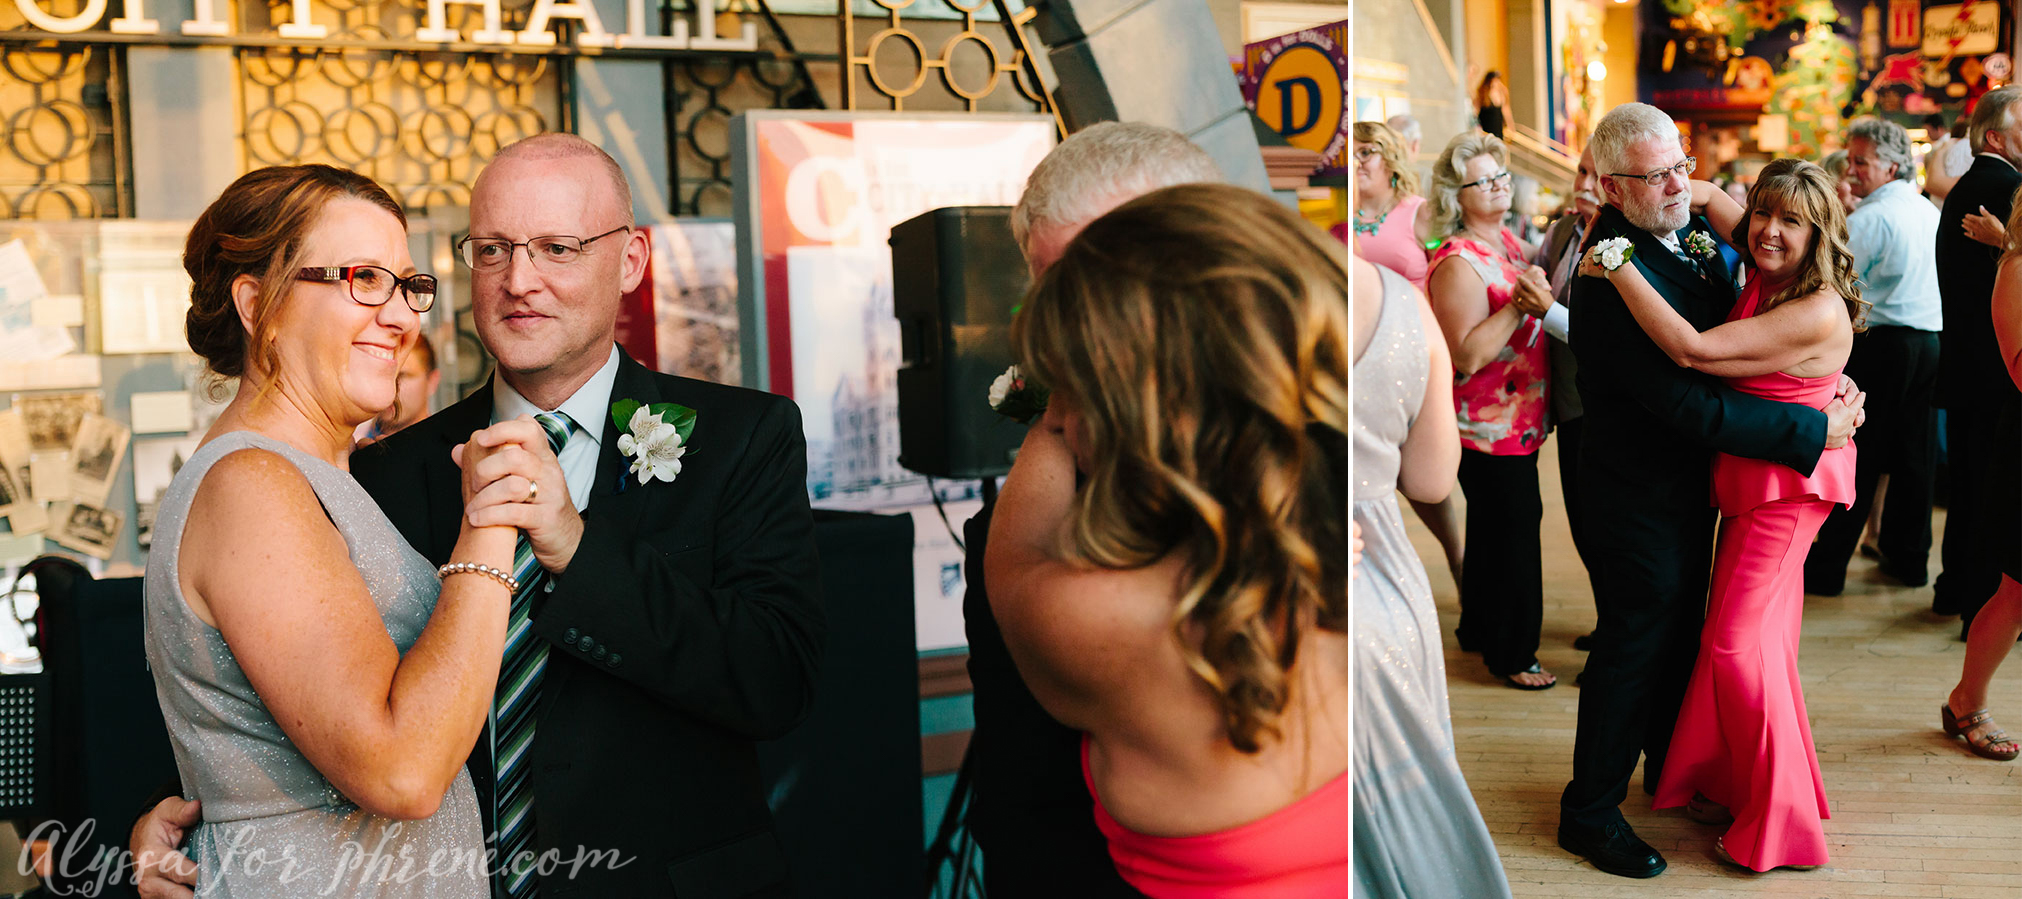 Grand_Rapids_Public_Museum_Wedding_130.jpg